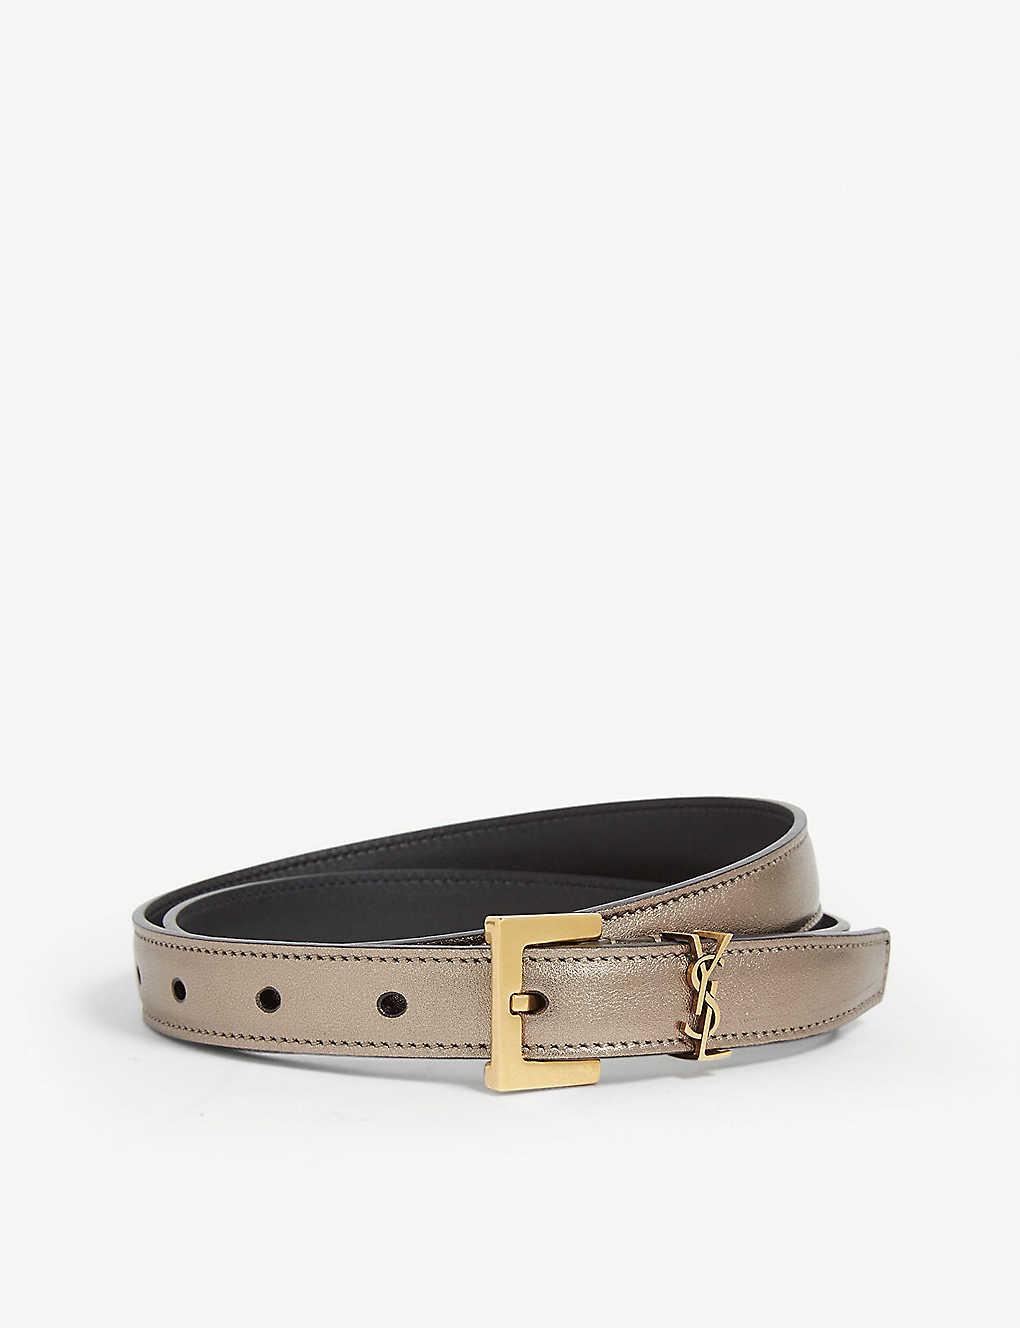 bb5a5532c SAINT LAURENT - YSL leather belt | Selfridges.com